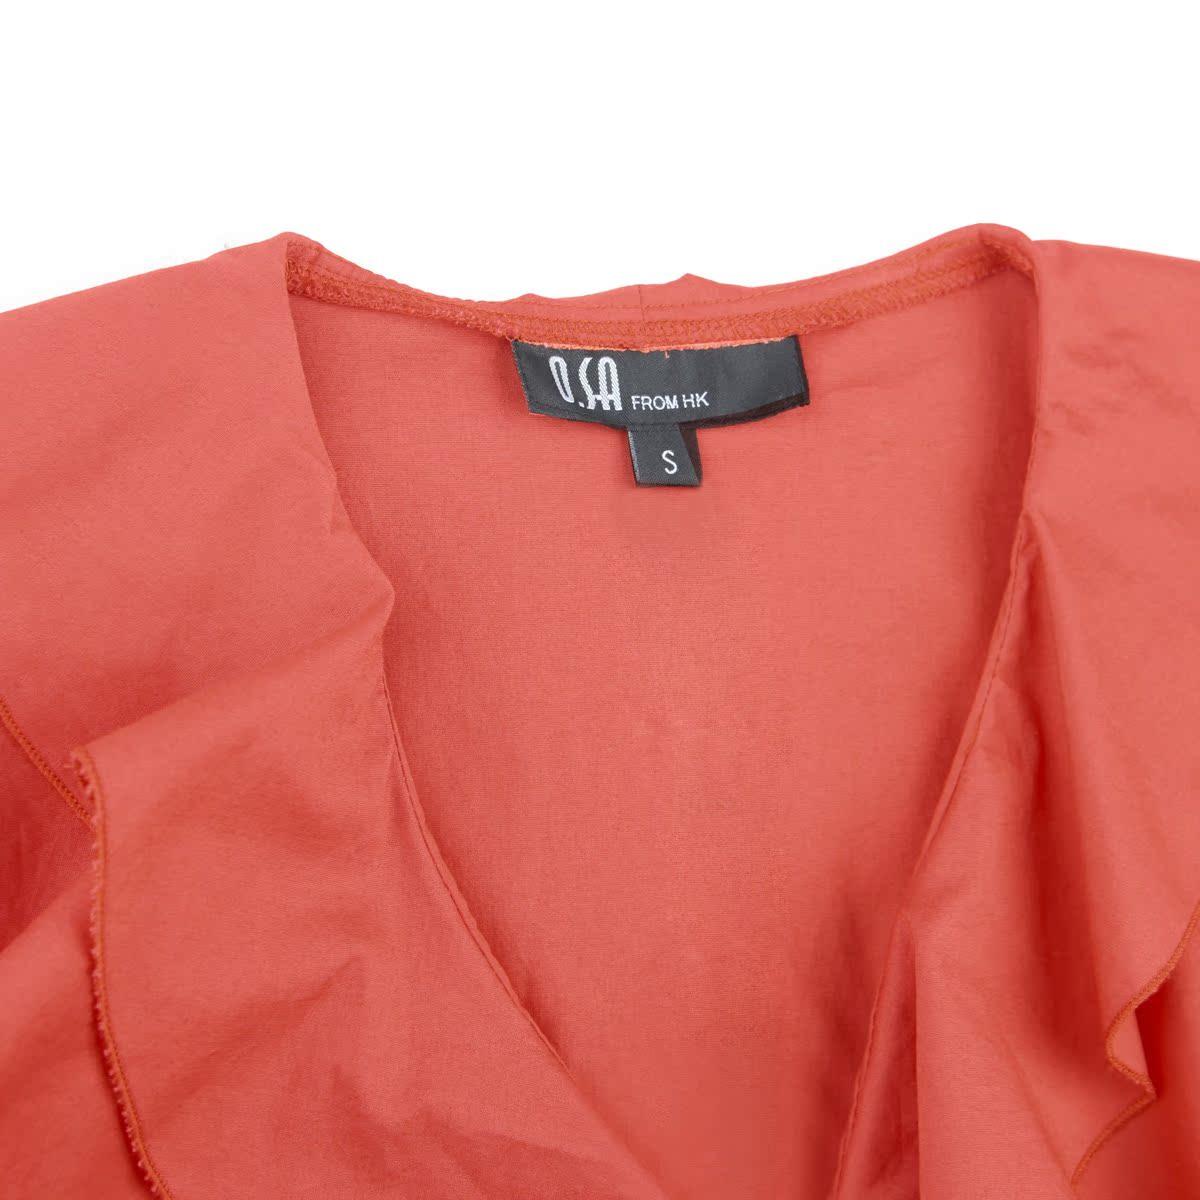 женская рубашка OSA sc00220 OSA2011 C00220